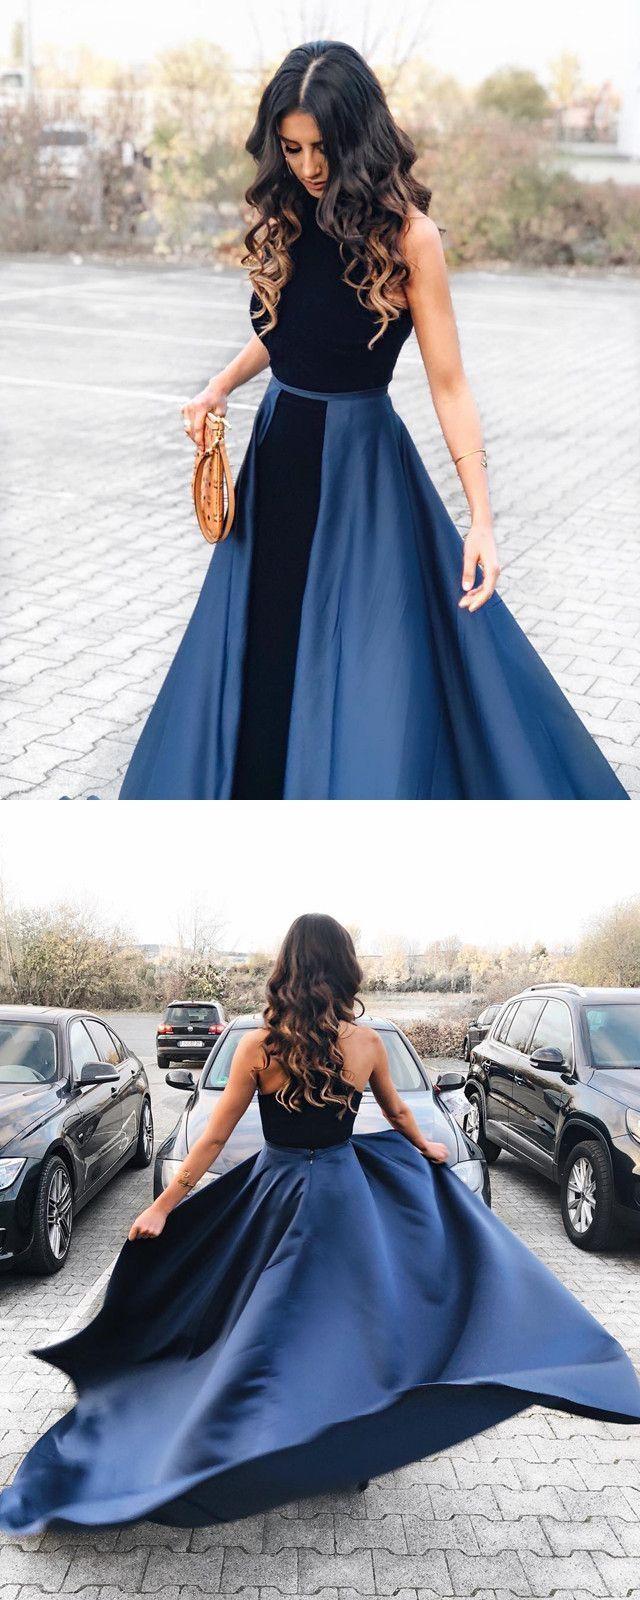 Open back prom dresses navy blue prom dresses prom dresses blue